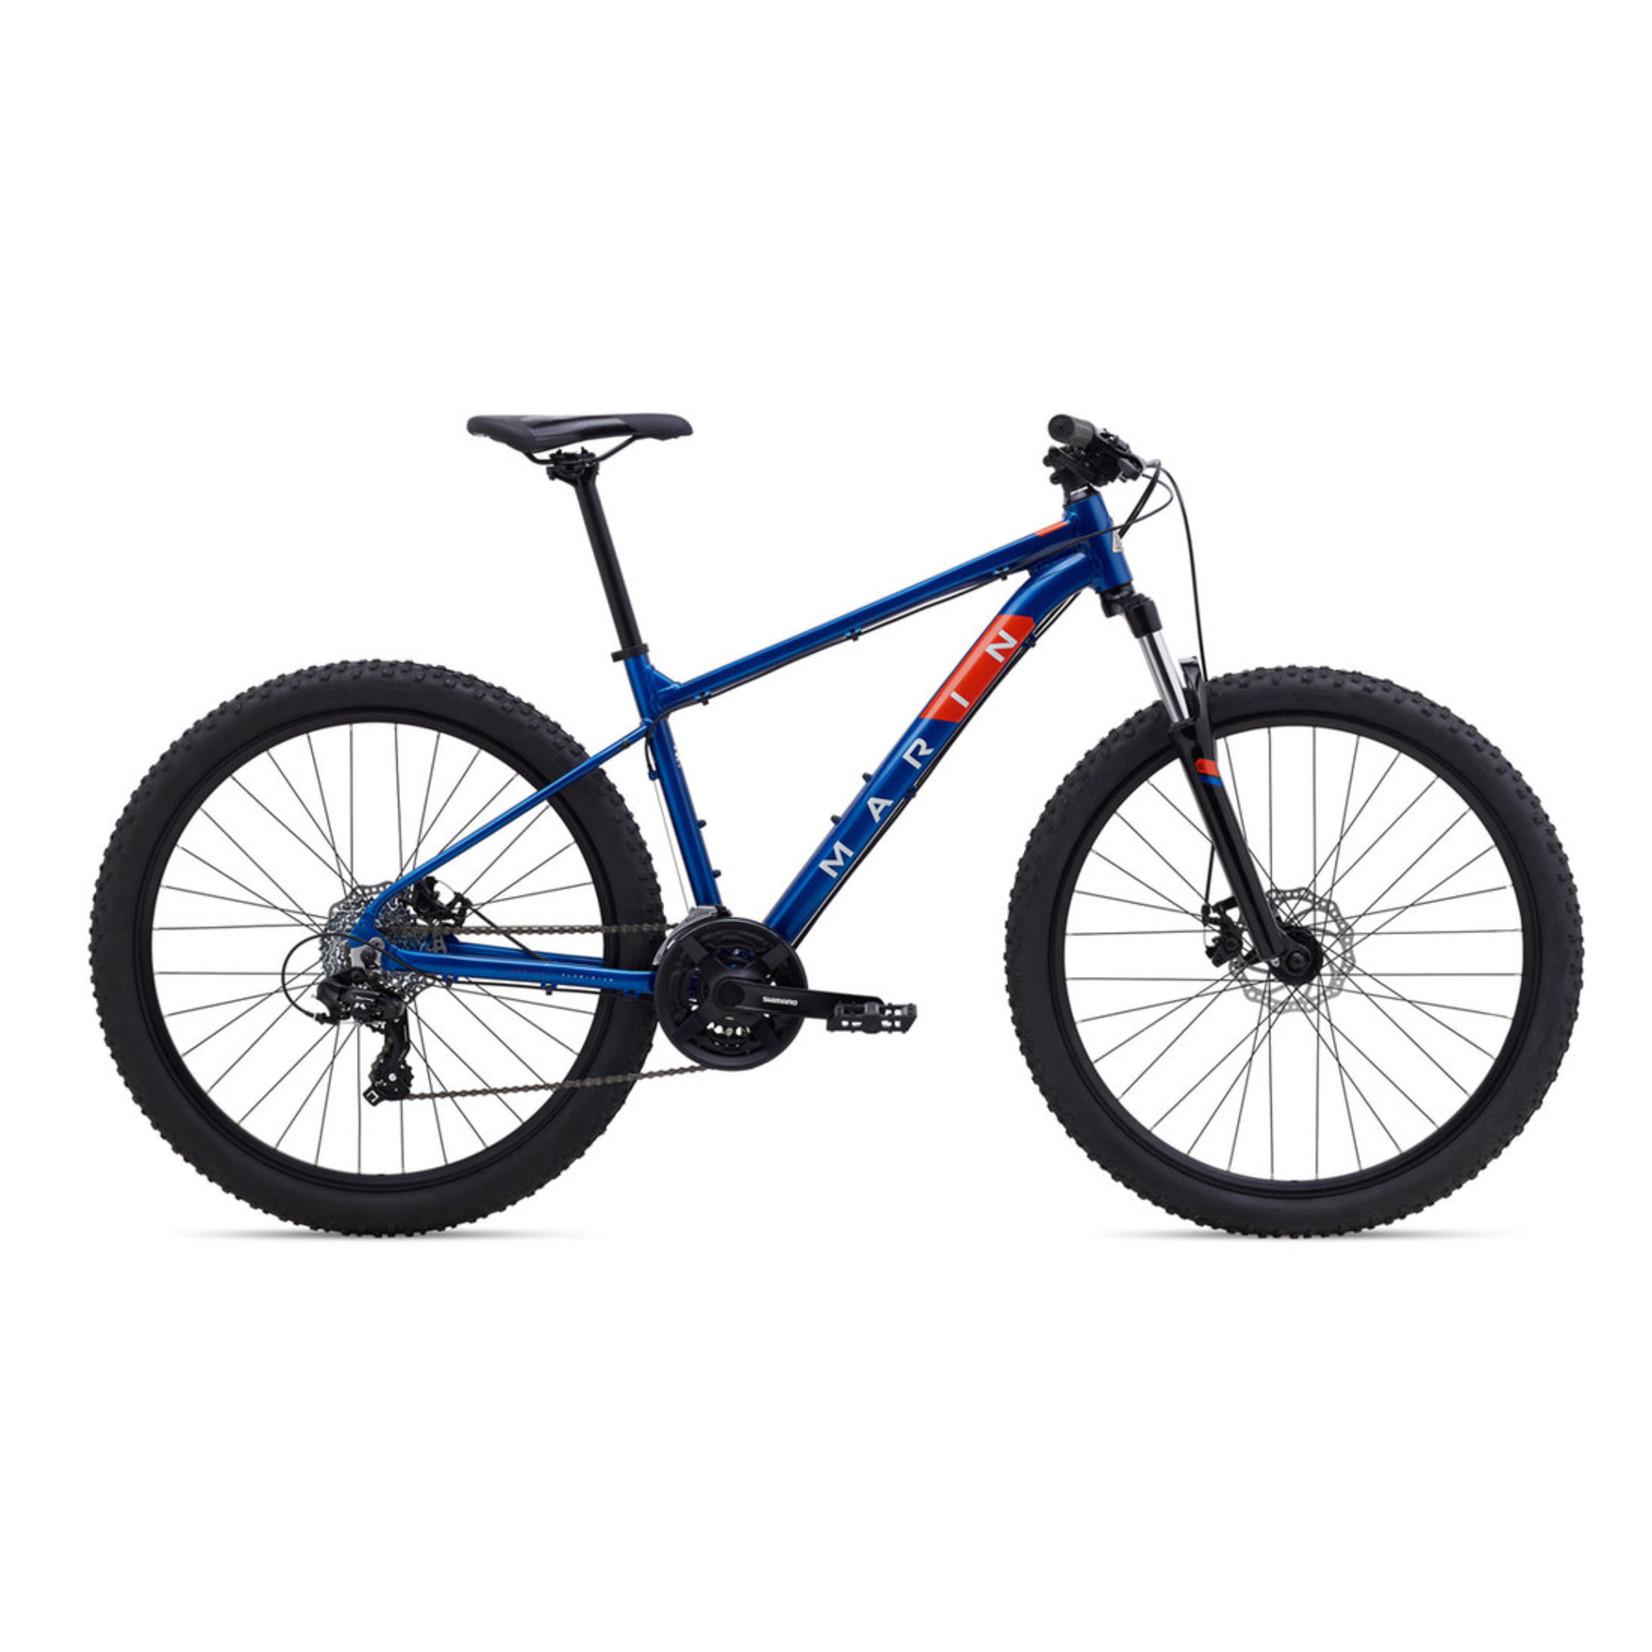 Marin Bikes Marin Bolinas Ridge 1 (2022)